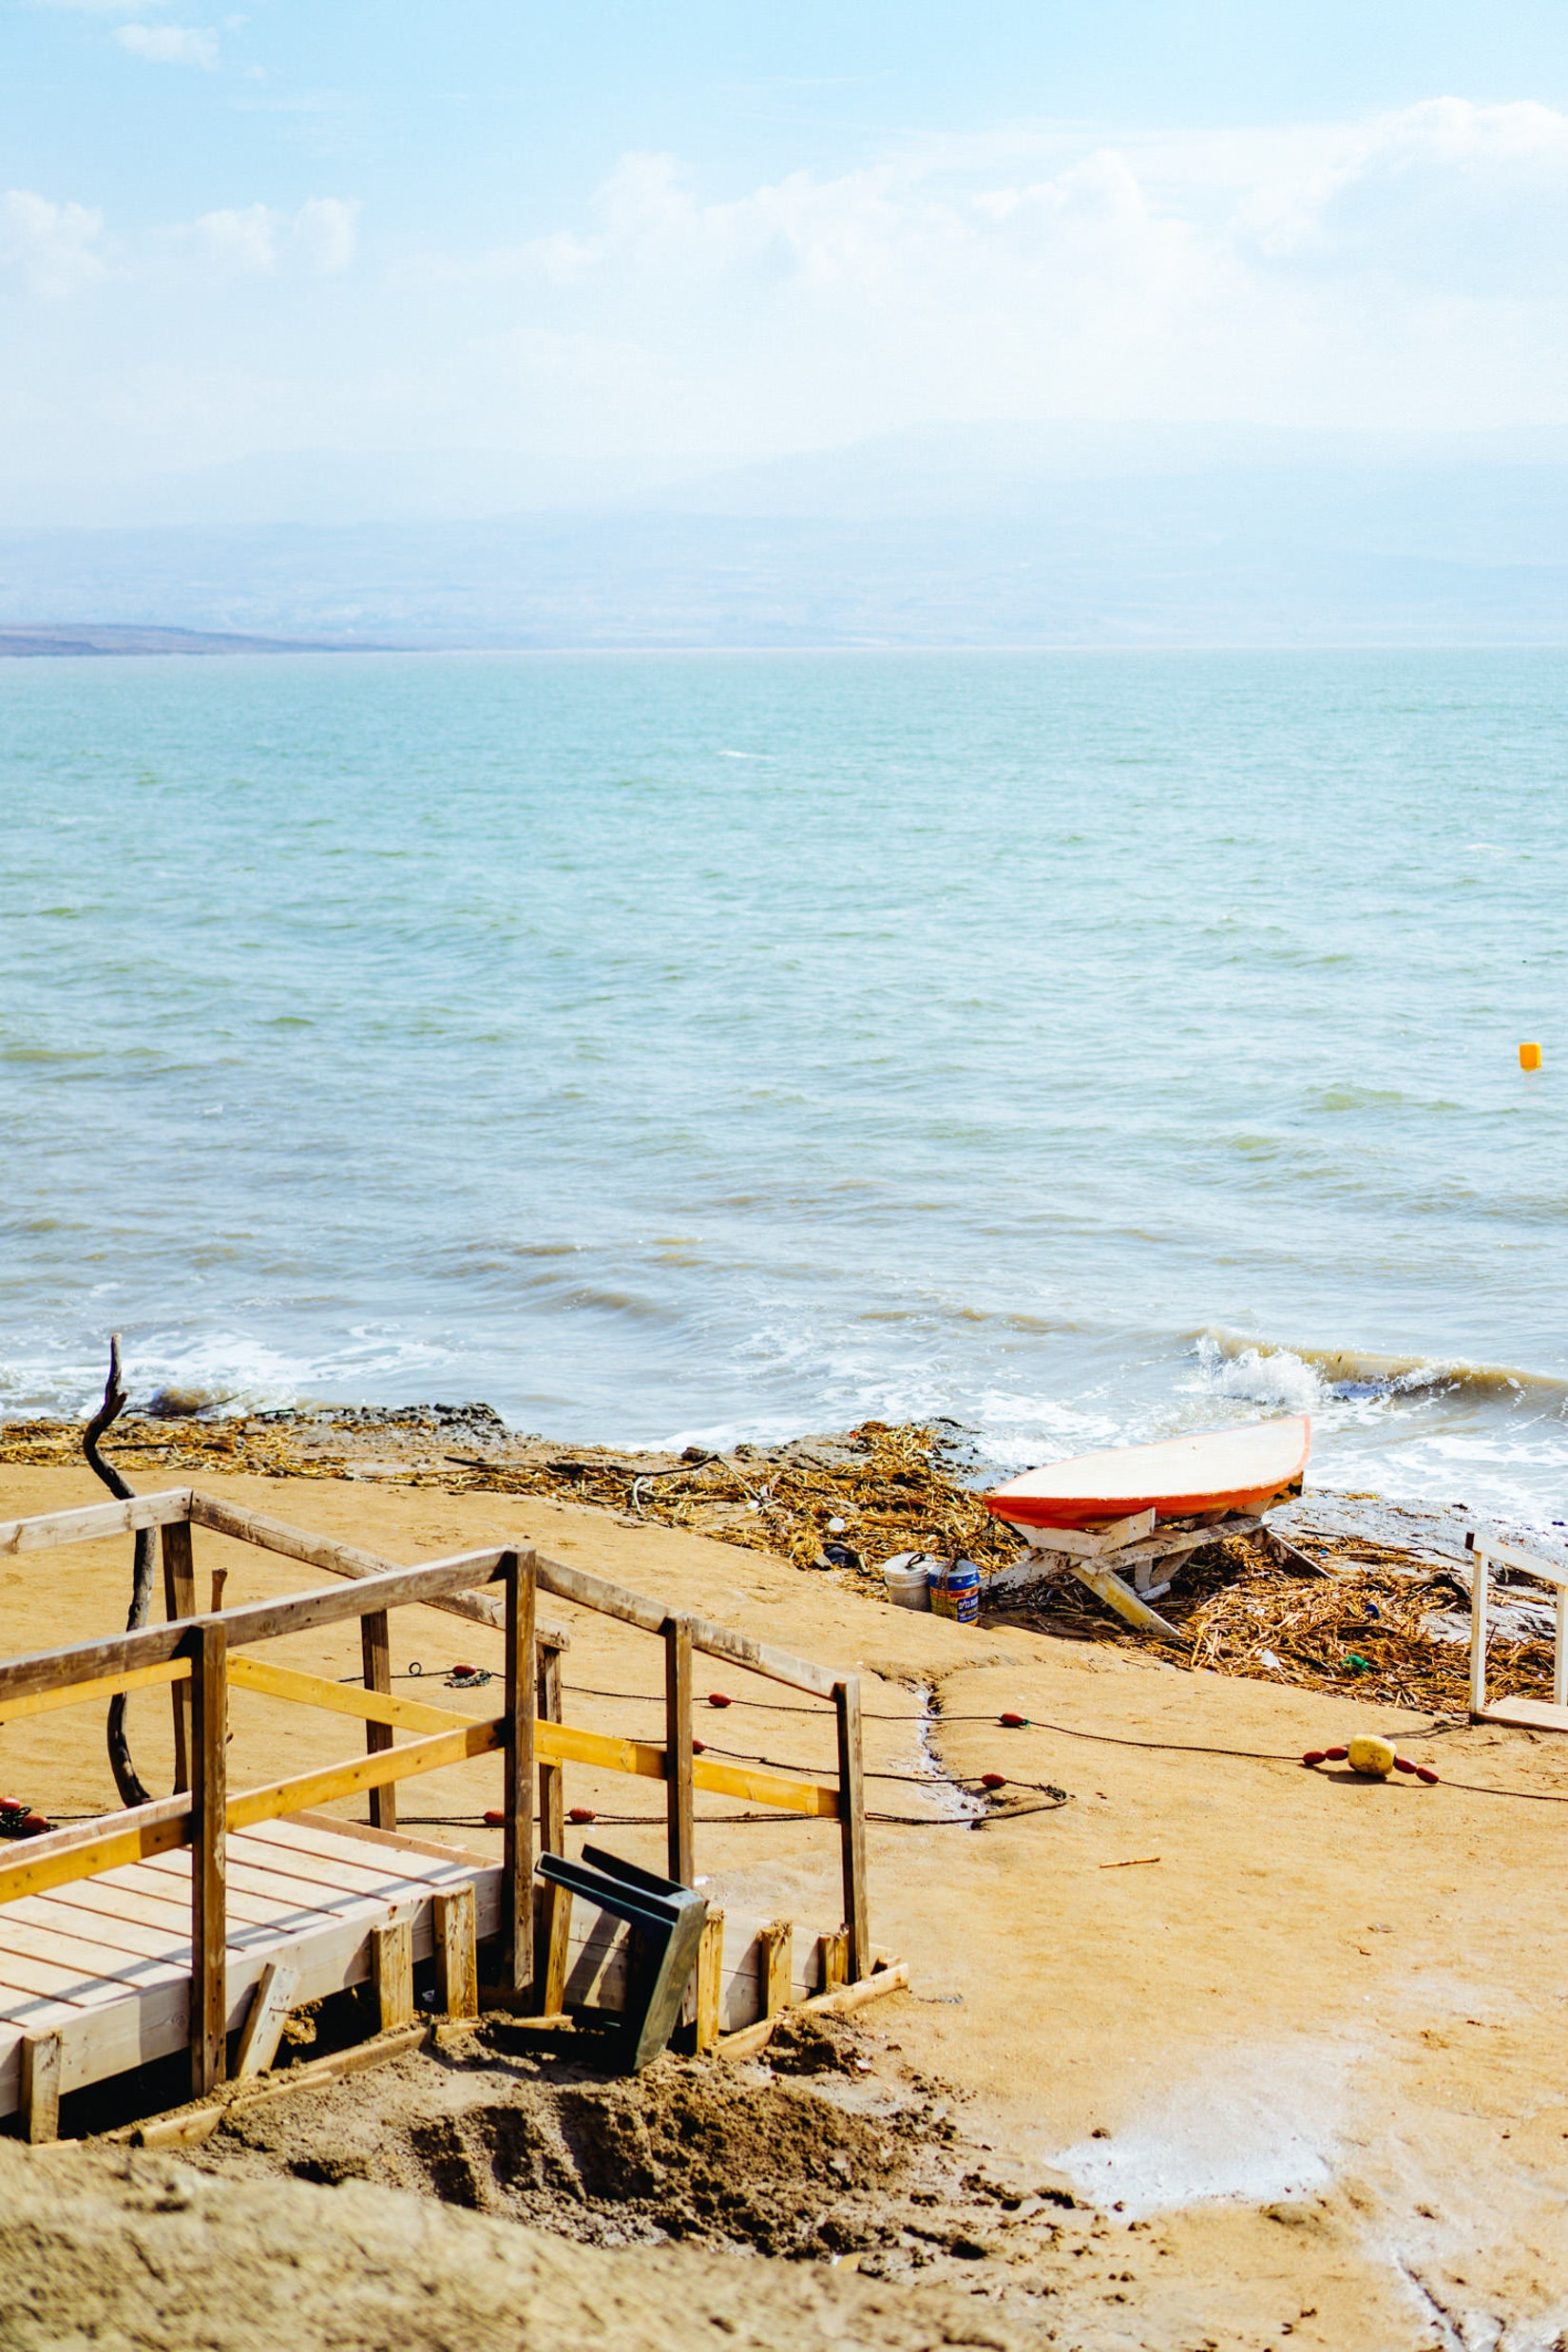 The beach at the Dead Sea